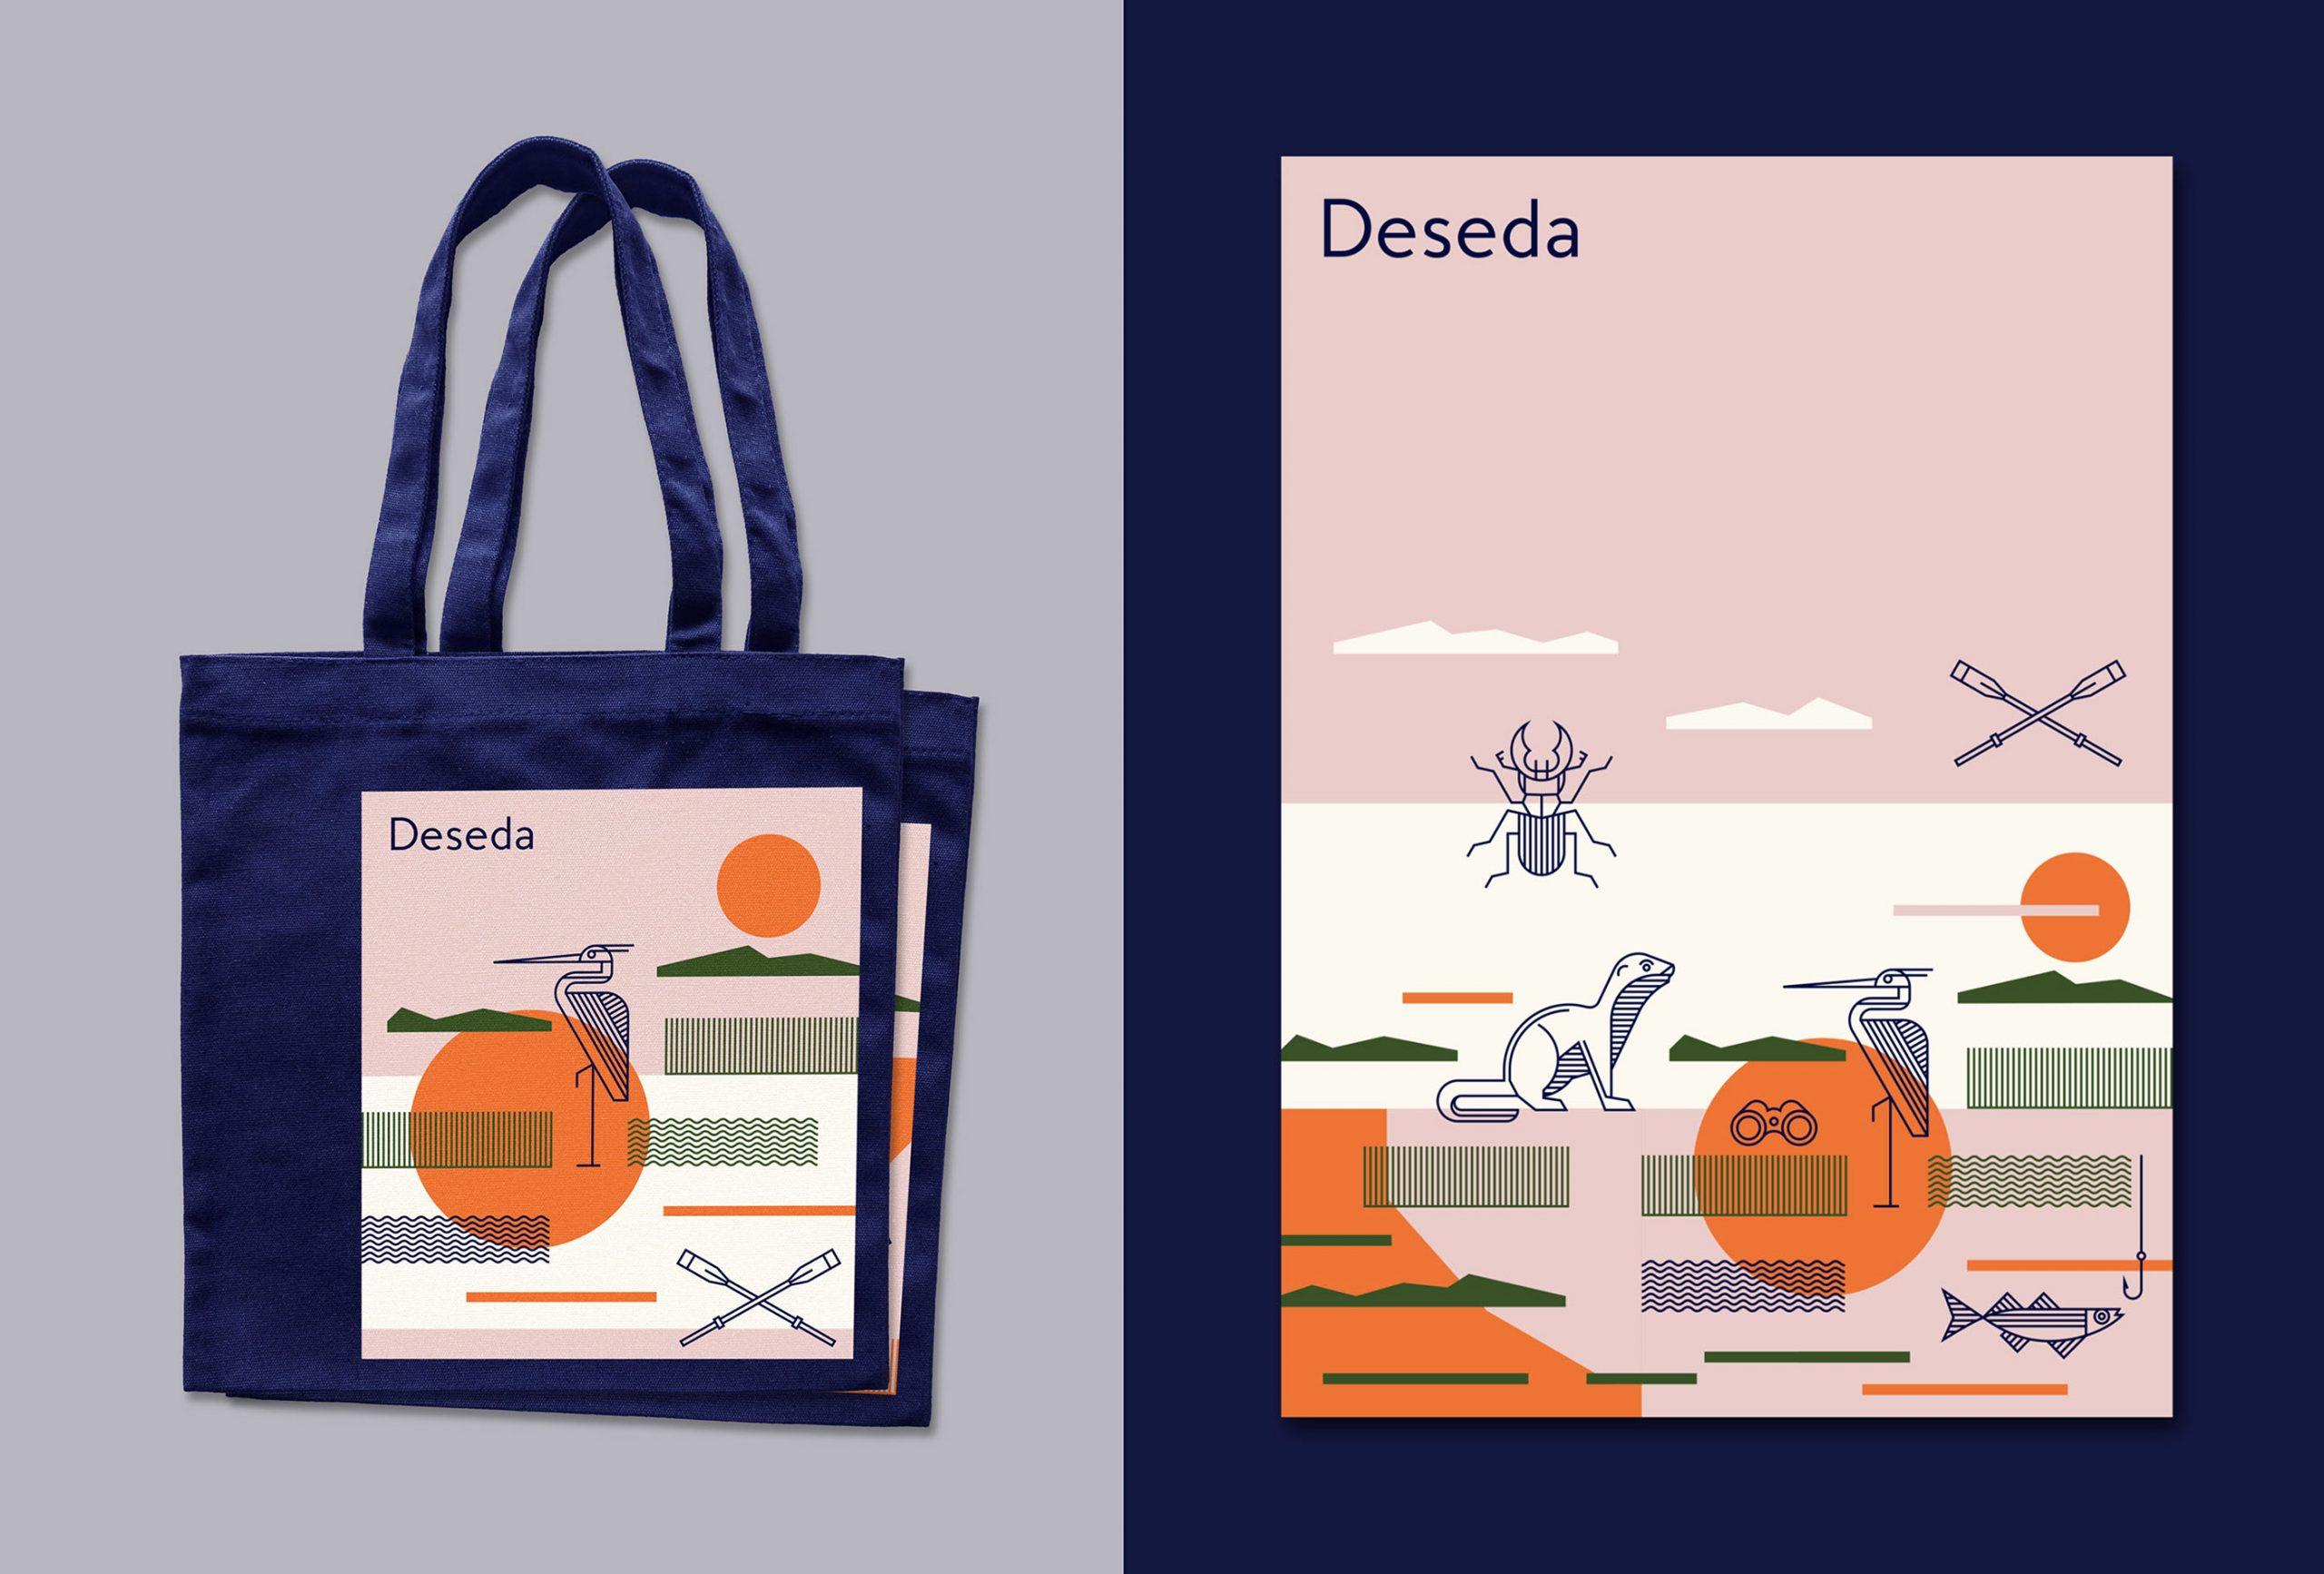 Deseda, Kaposvar City Branding KissMiklos